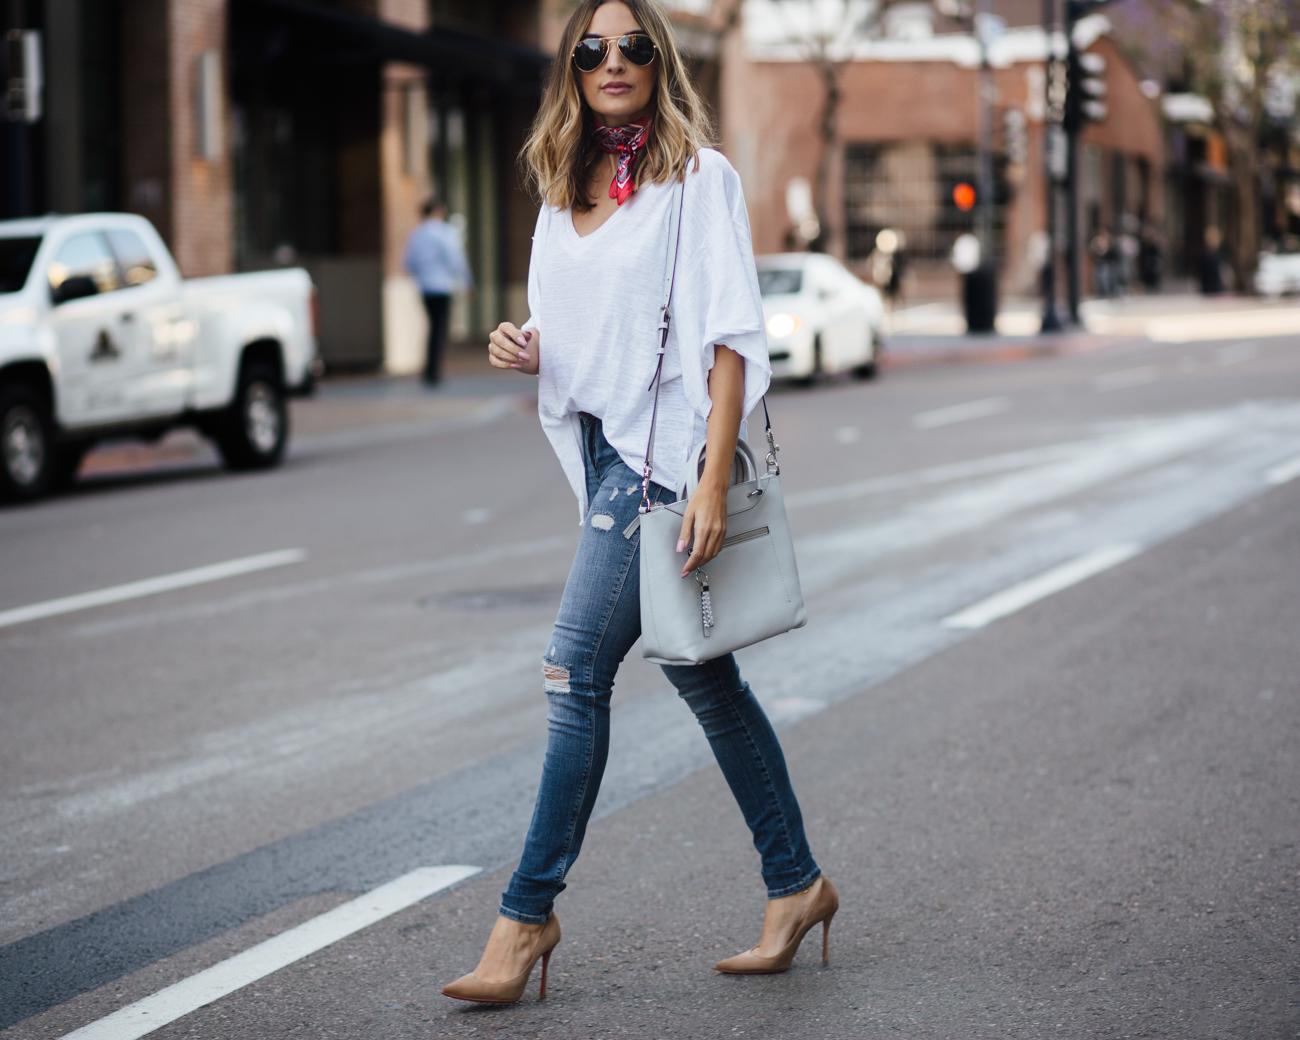 5 Fashion Blog Photography Tips